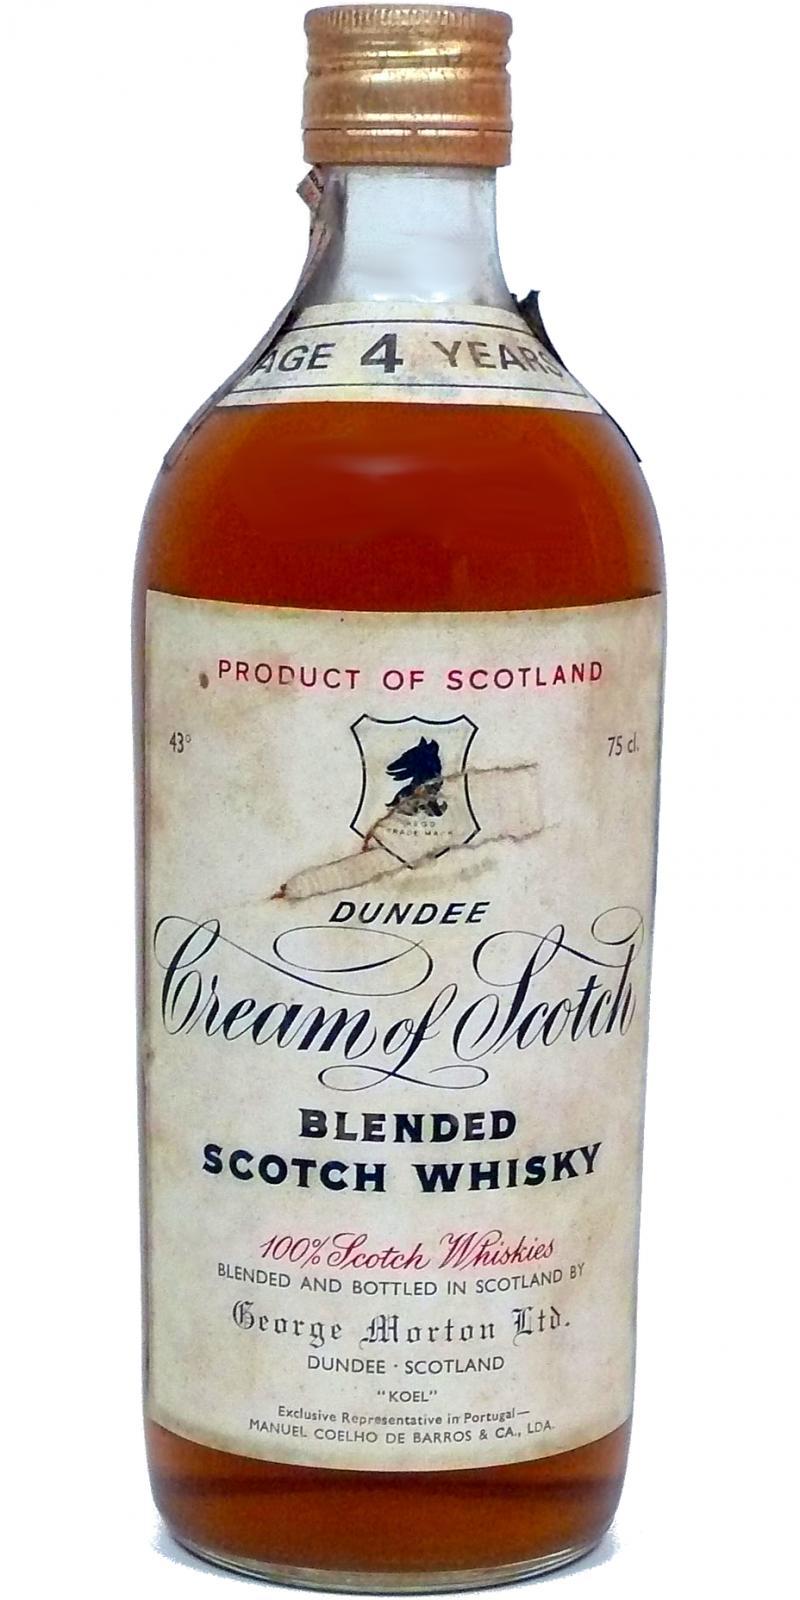 Cream of Scotch 04-year-old